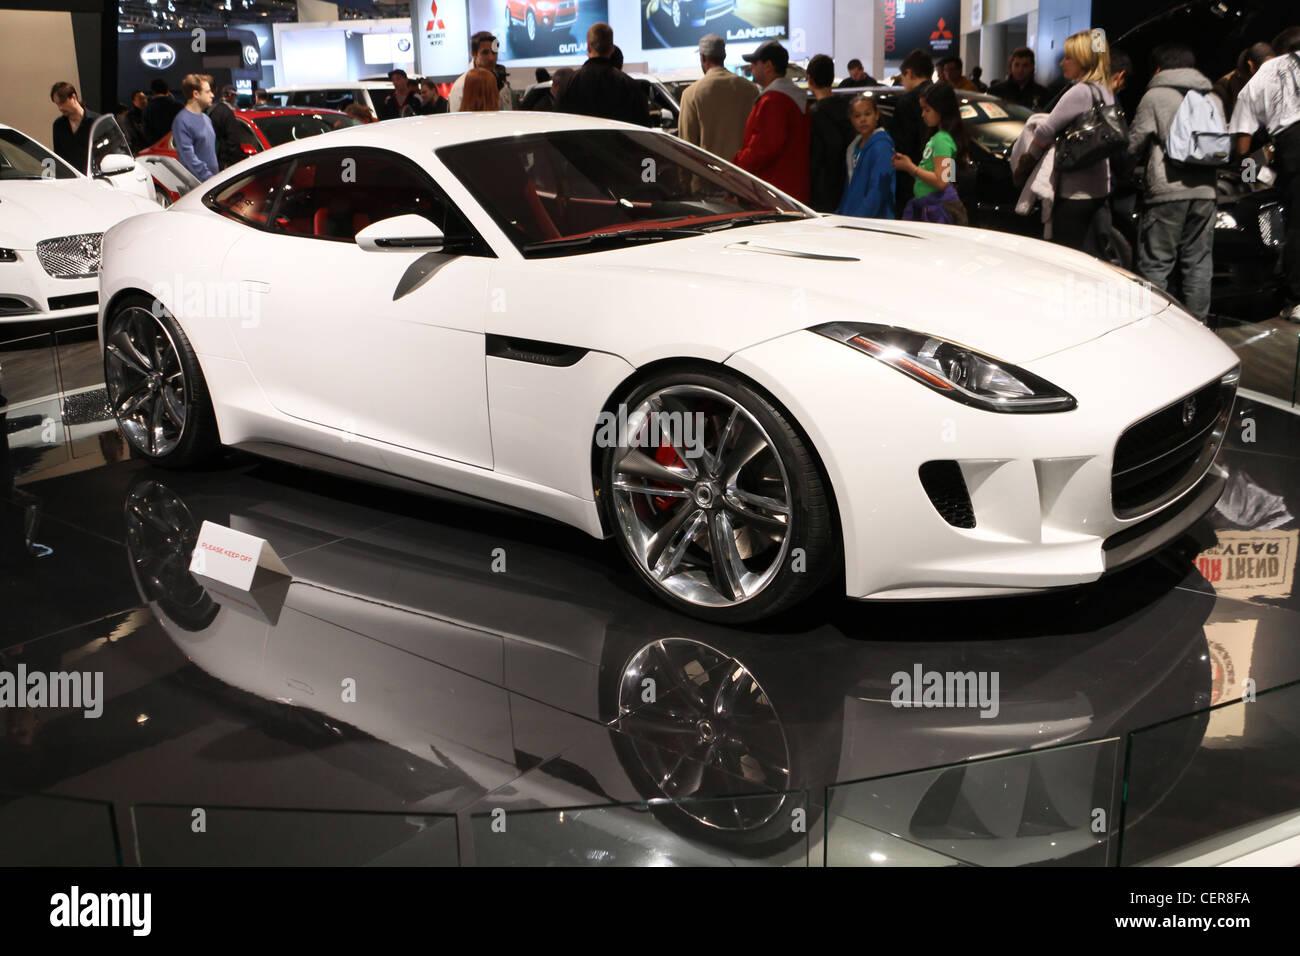 White Expensive Luxury Sports Car Jaguar Cx16 Stock Photo 43537518